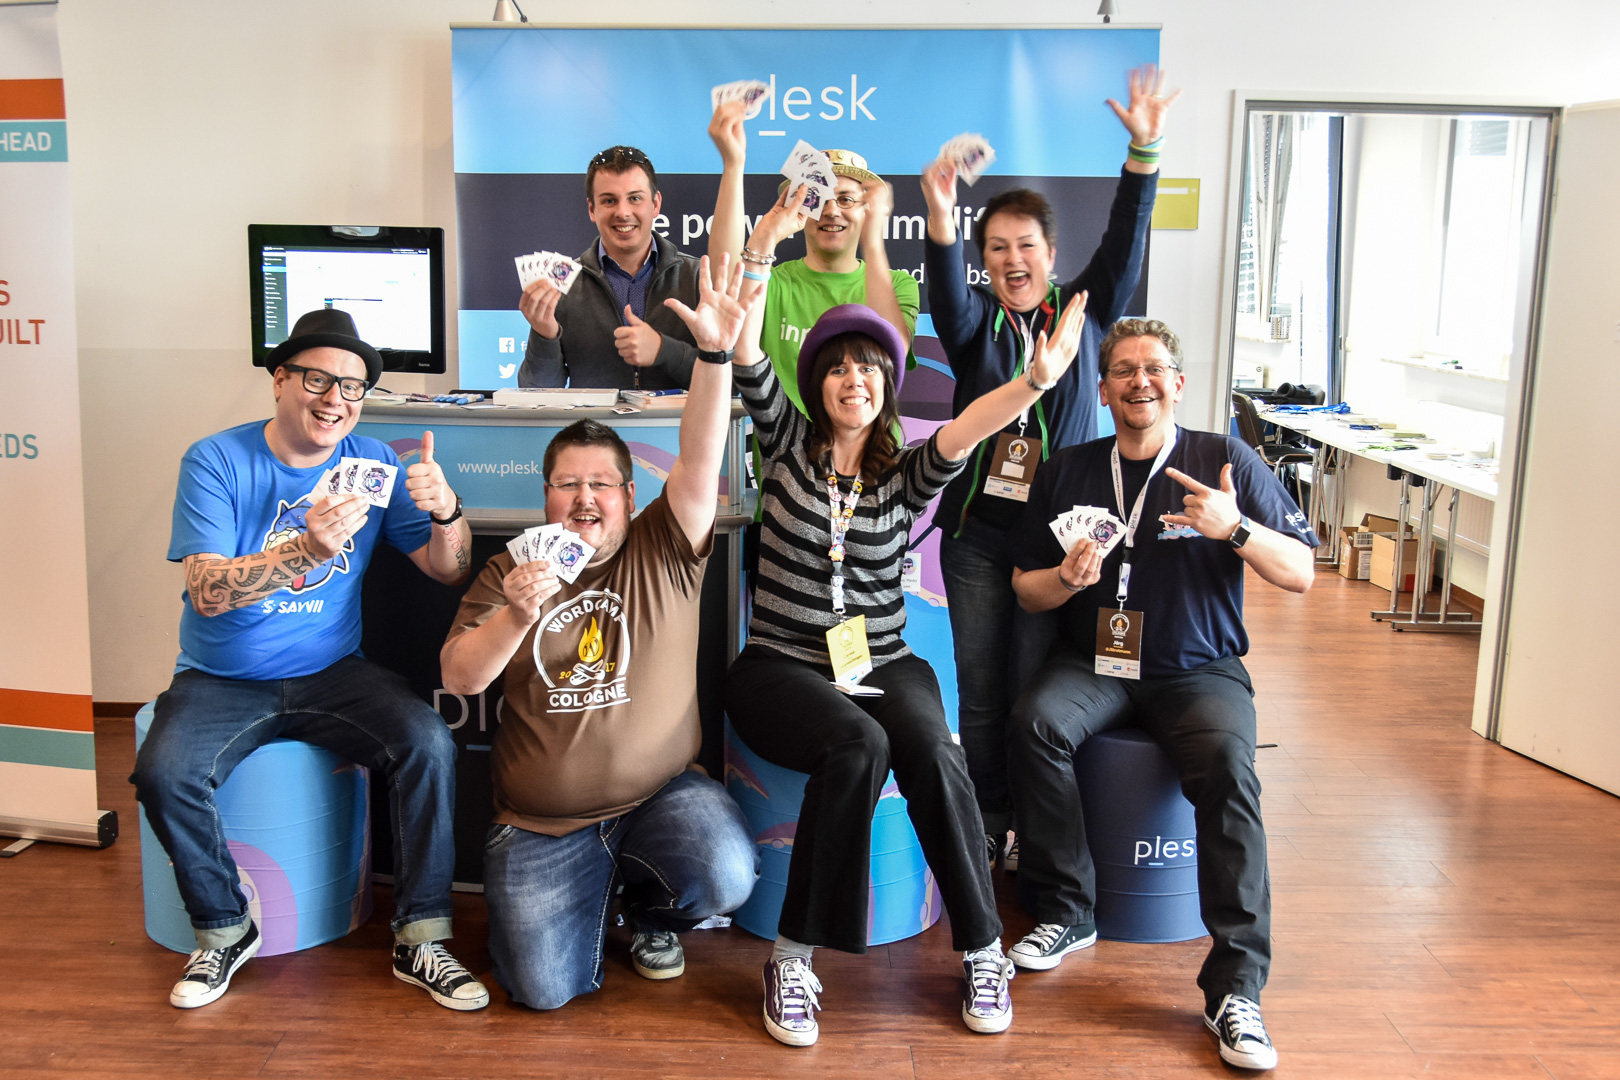 WordCamp Cologne, release of the Octapuu, Plesk's WordPress mascot with Bas Brader, Matthias Kurz, Daniel Stanitzek, Matthias Kurz, Robert Windisch, Carole Olinger, Patricia Hillebrand and Jörg Strotmann